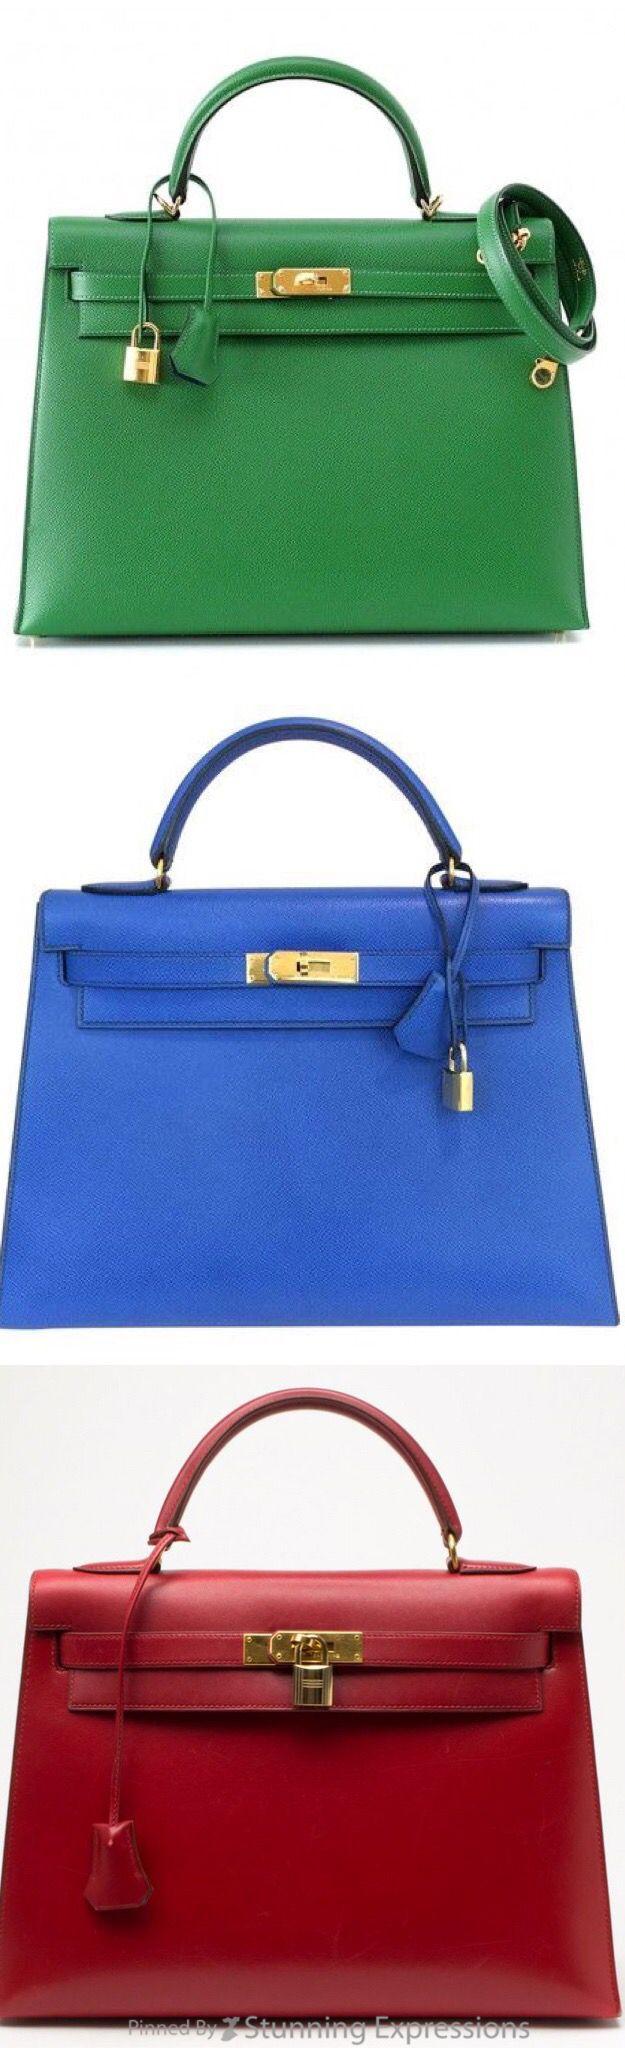 Kelly Bag - Hermes Women's Handbags Wallets - amzn.to/2huZdIM Women's Handbags & Wallets - http://amzn.to/2iZOQZT